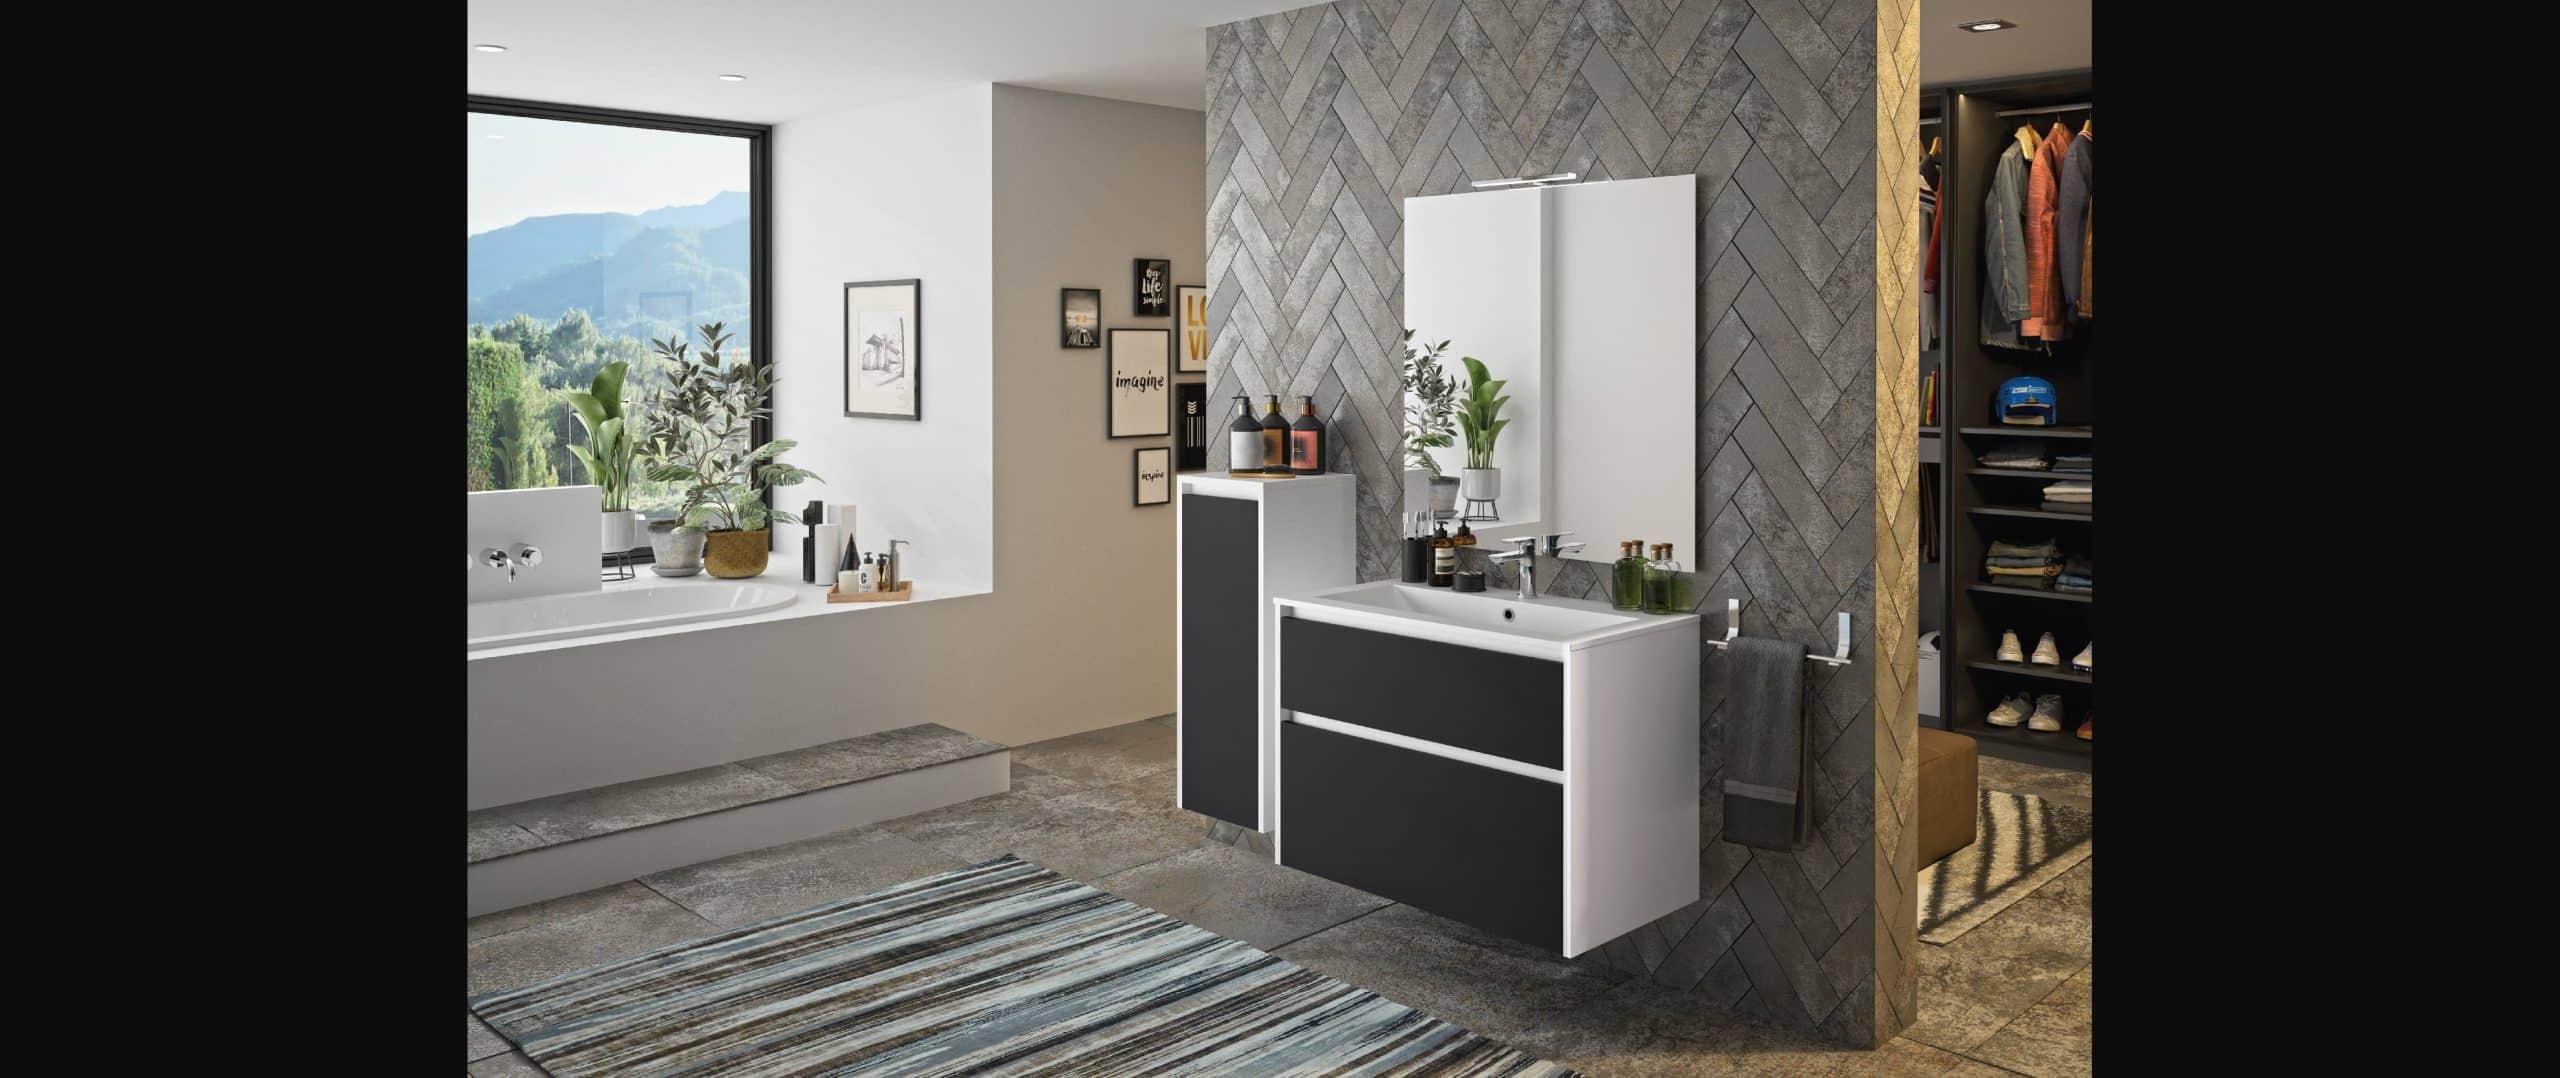 salle de bains zaho noir mat haut de gamme